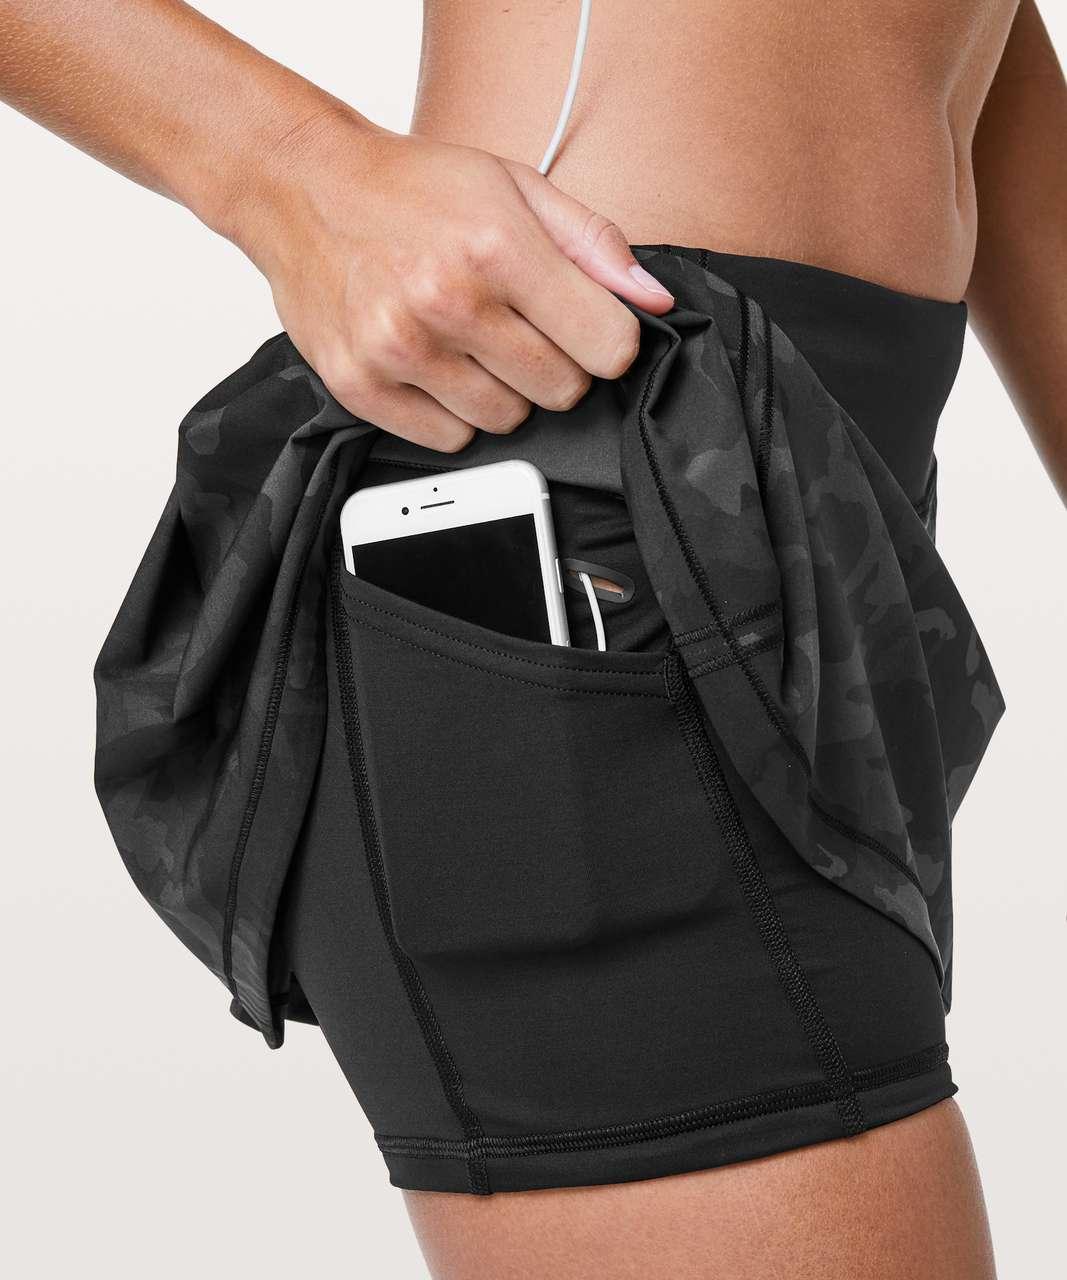 Lululemon Pace Rival Skirt (Regular) *No Panels - Incognito Camo Multi Grey / Black